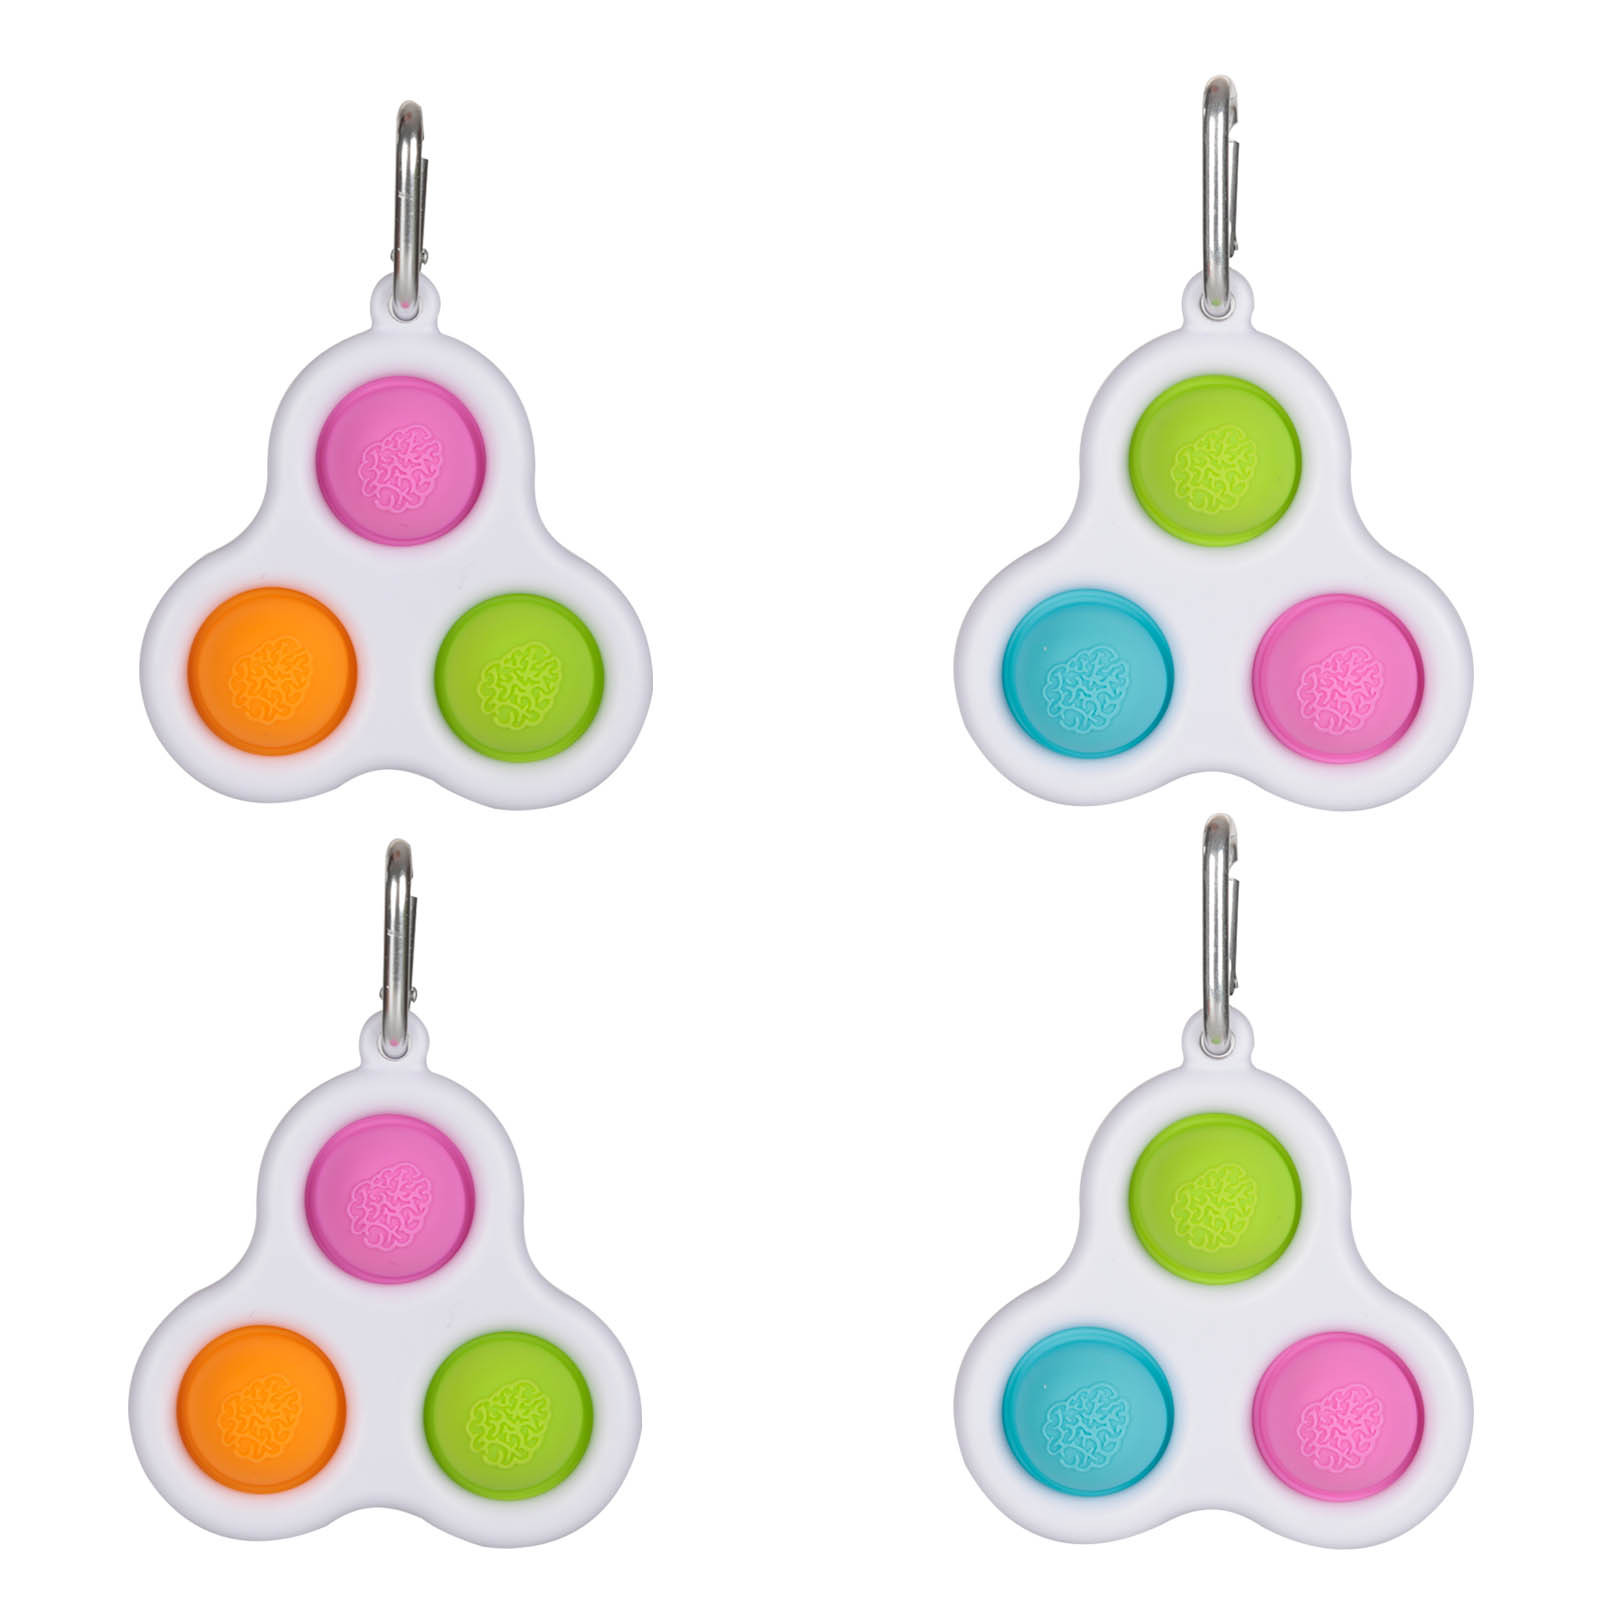 Montessori Fidget Dimple Simple Fidget Toys Fat Brain Toys Push Stress Relief Hand Toys img2